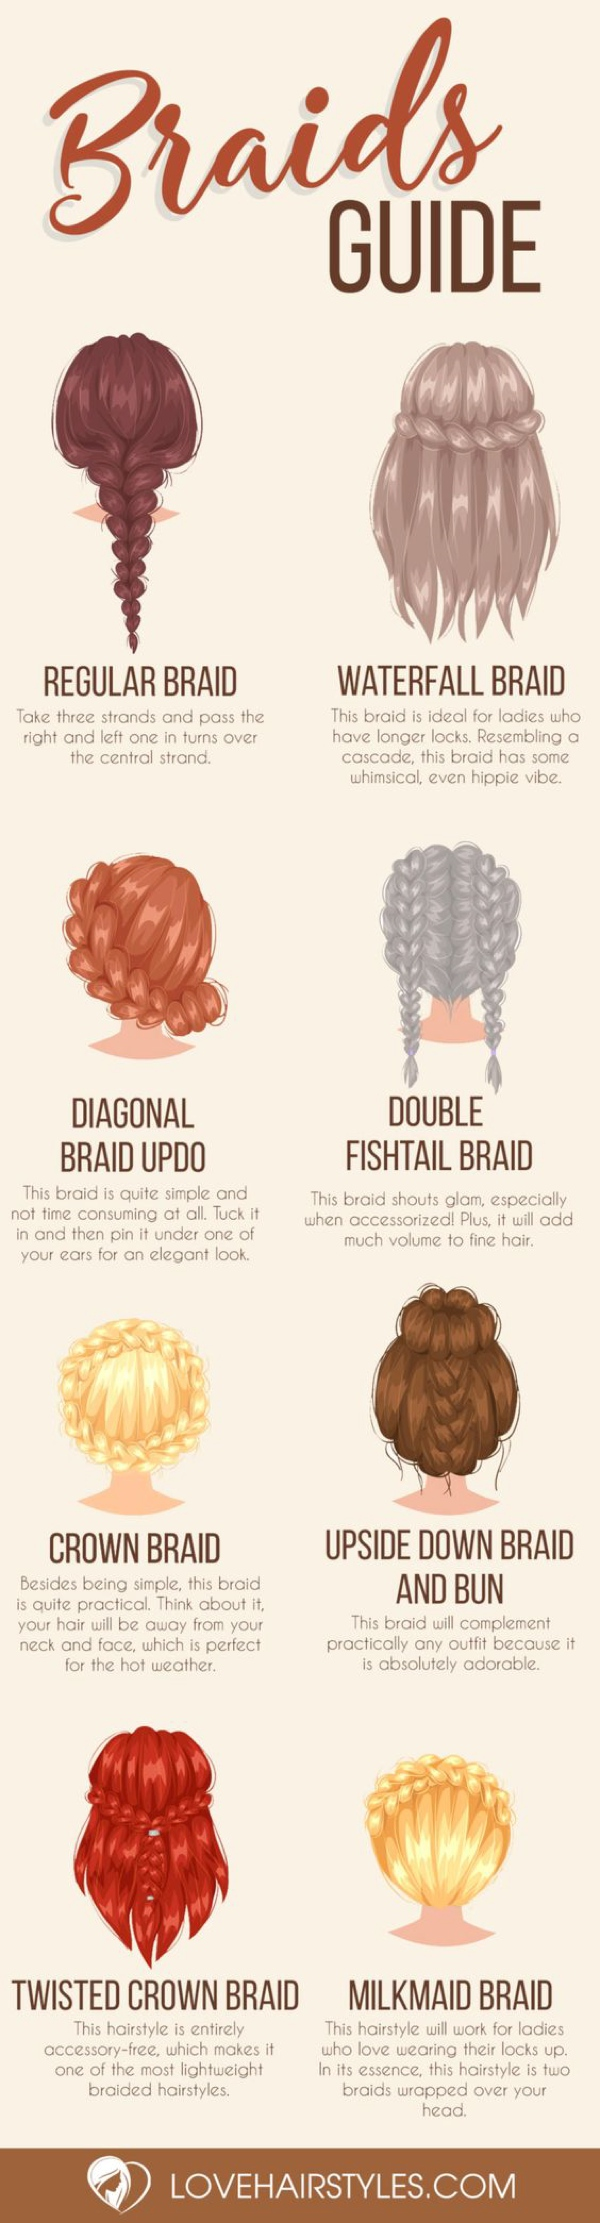 braids guide